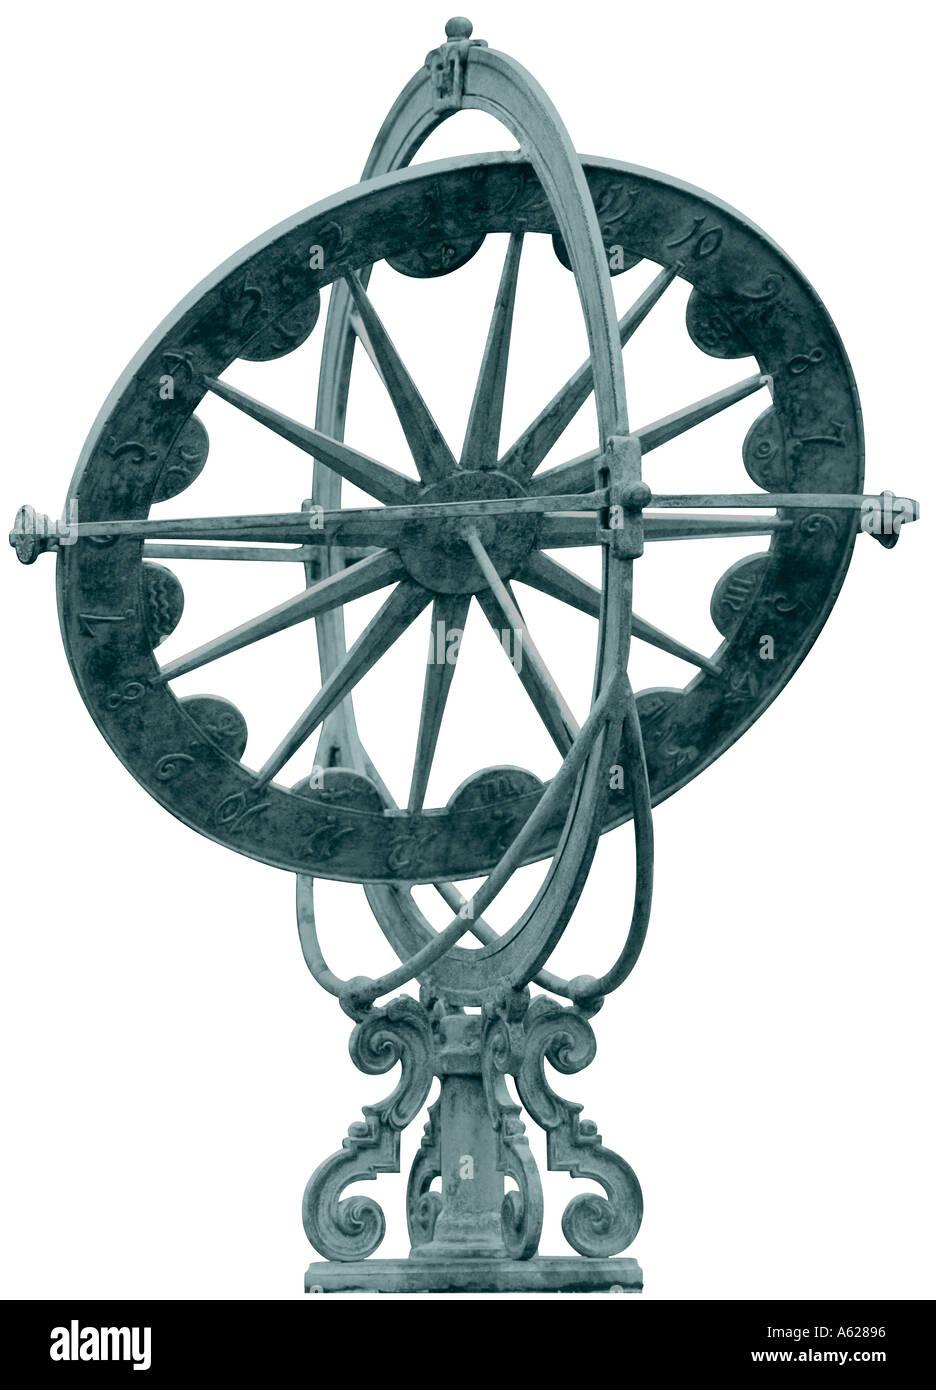 Armillary or sundial - Stock Image